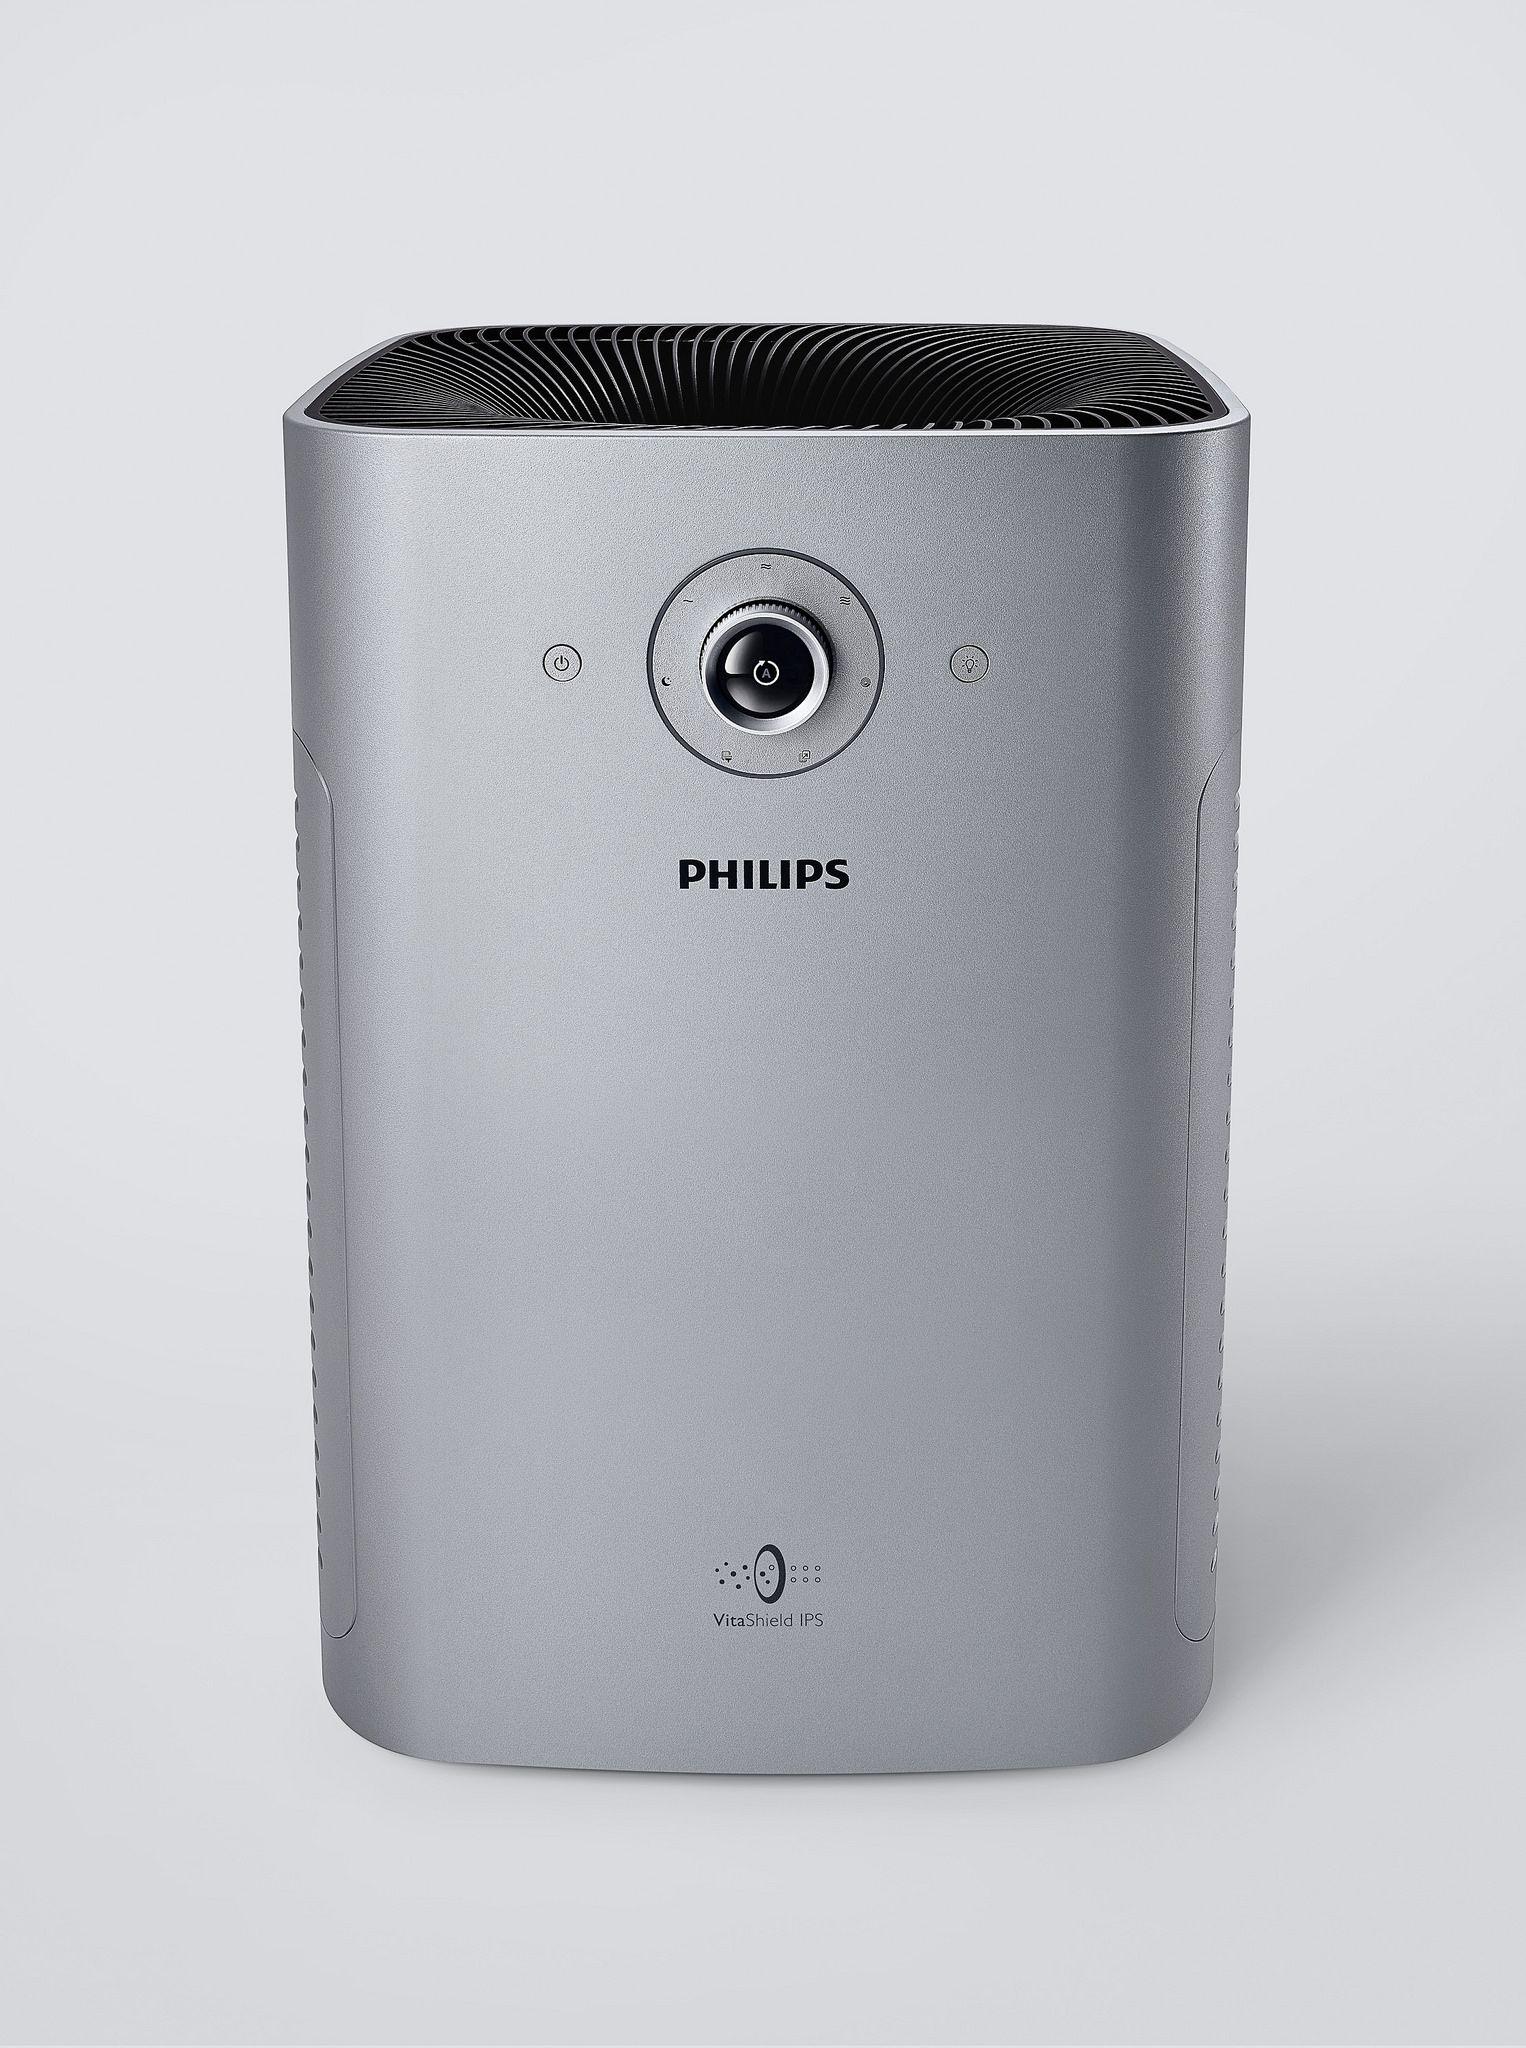 Philips Air purifier, Electronics design, Design awards